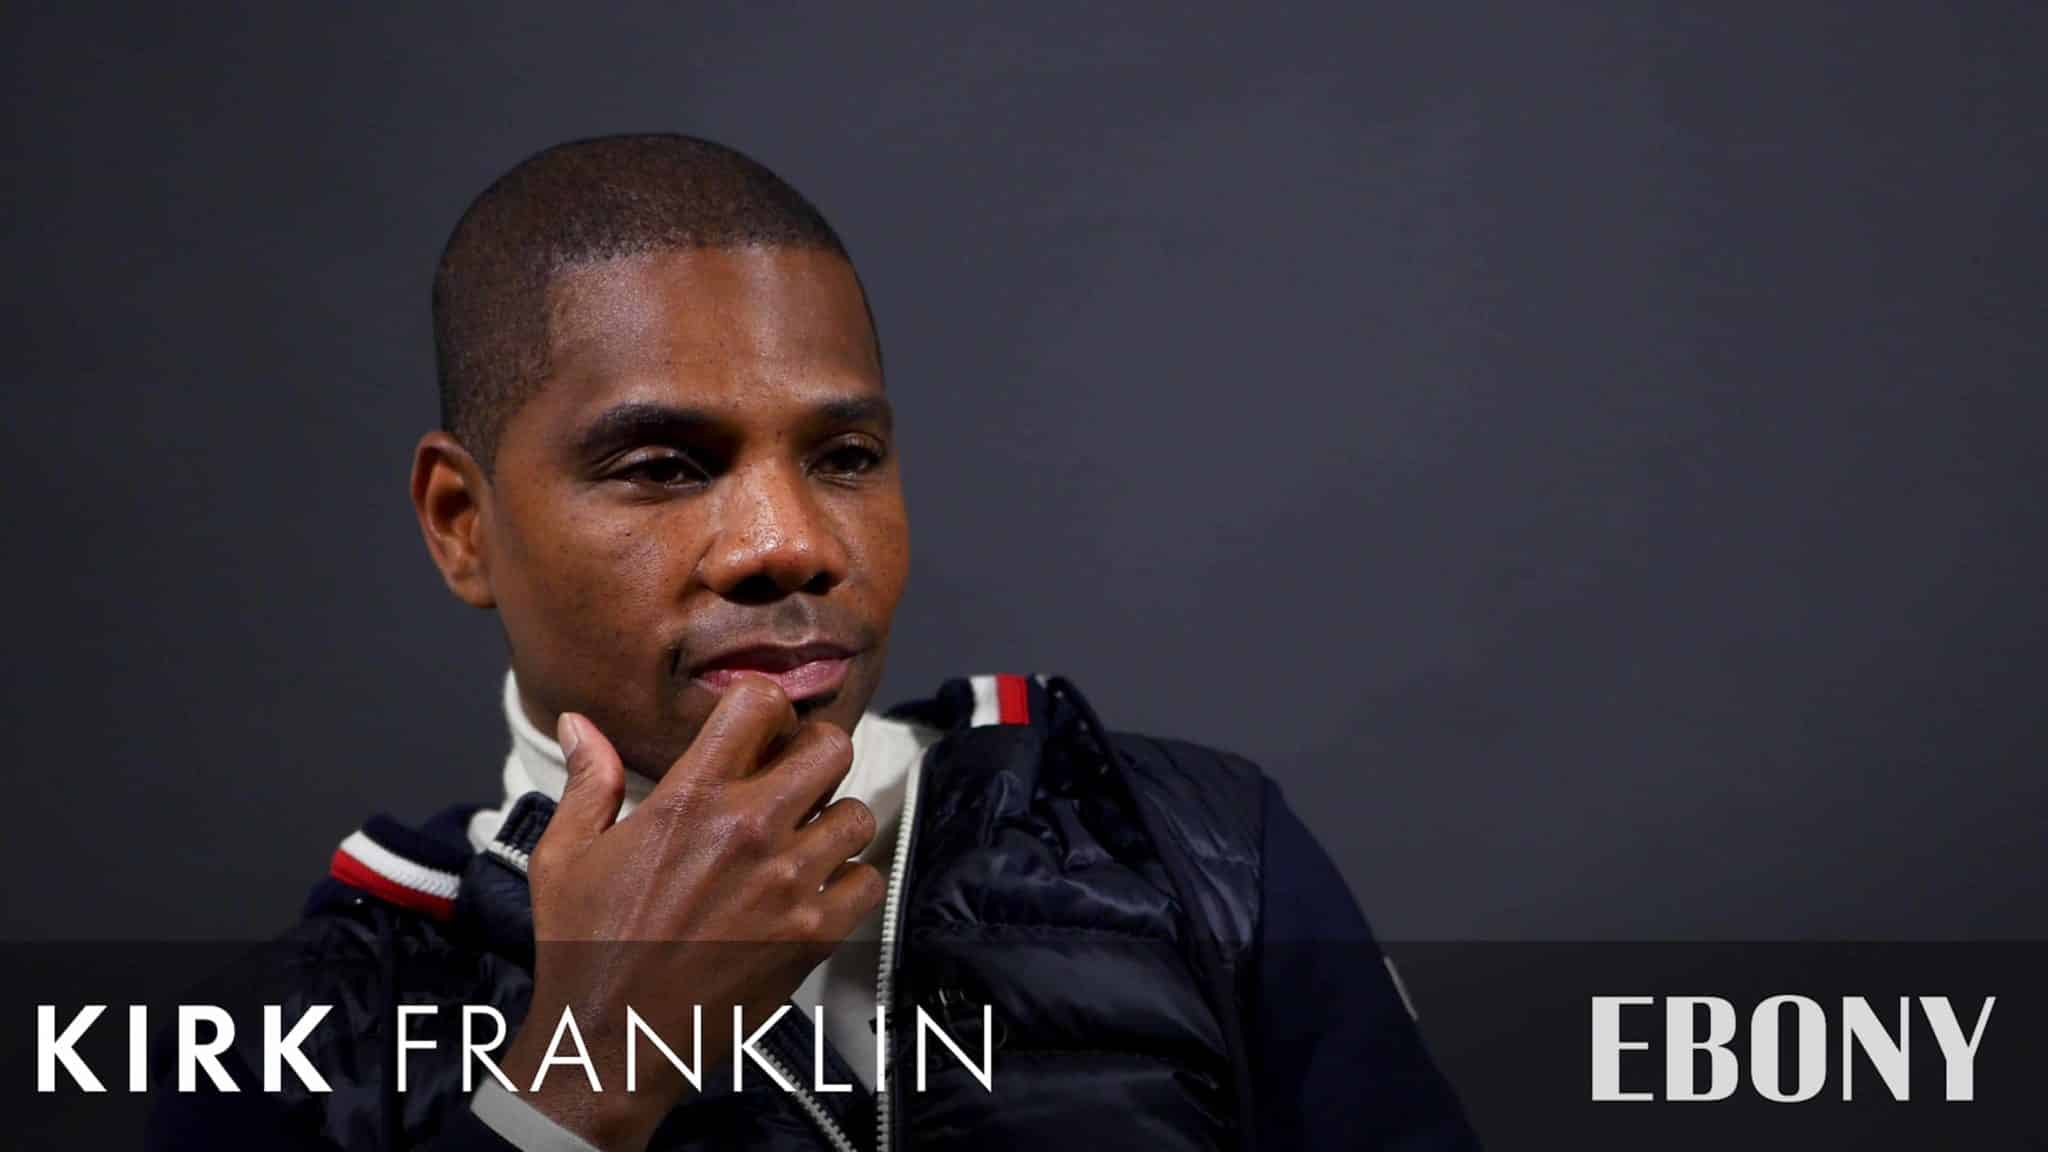 Kirk Franklin Talks 'LONG LIVE LOVE' Album, Clark Sisters Biopic & More